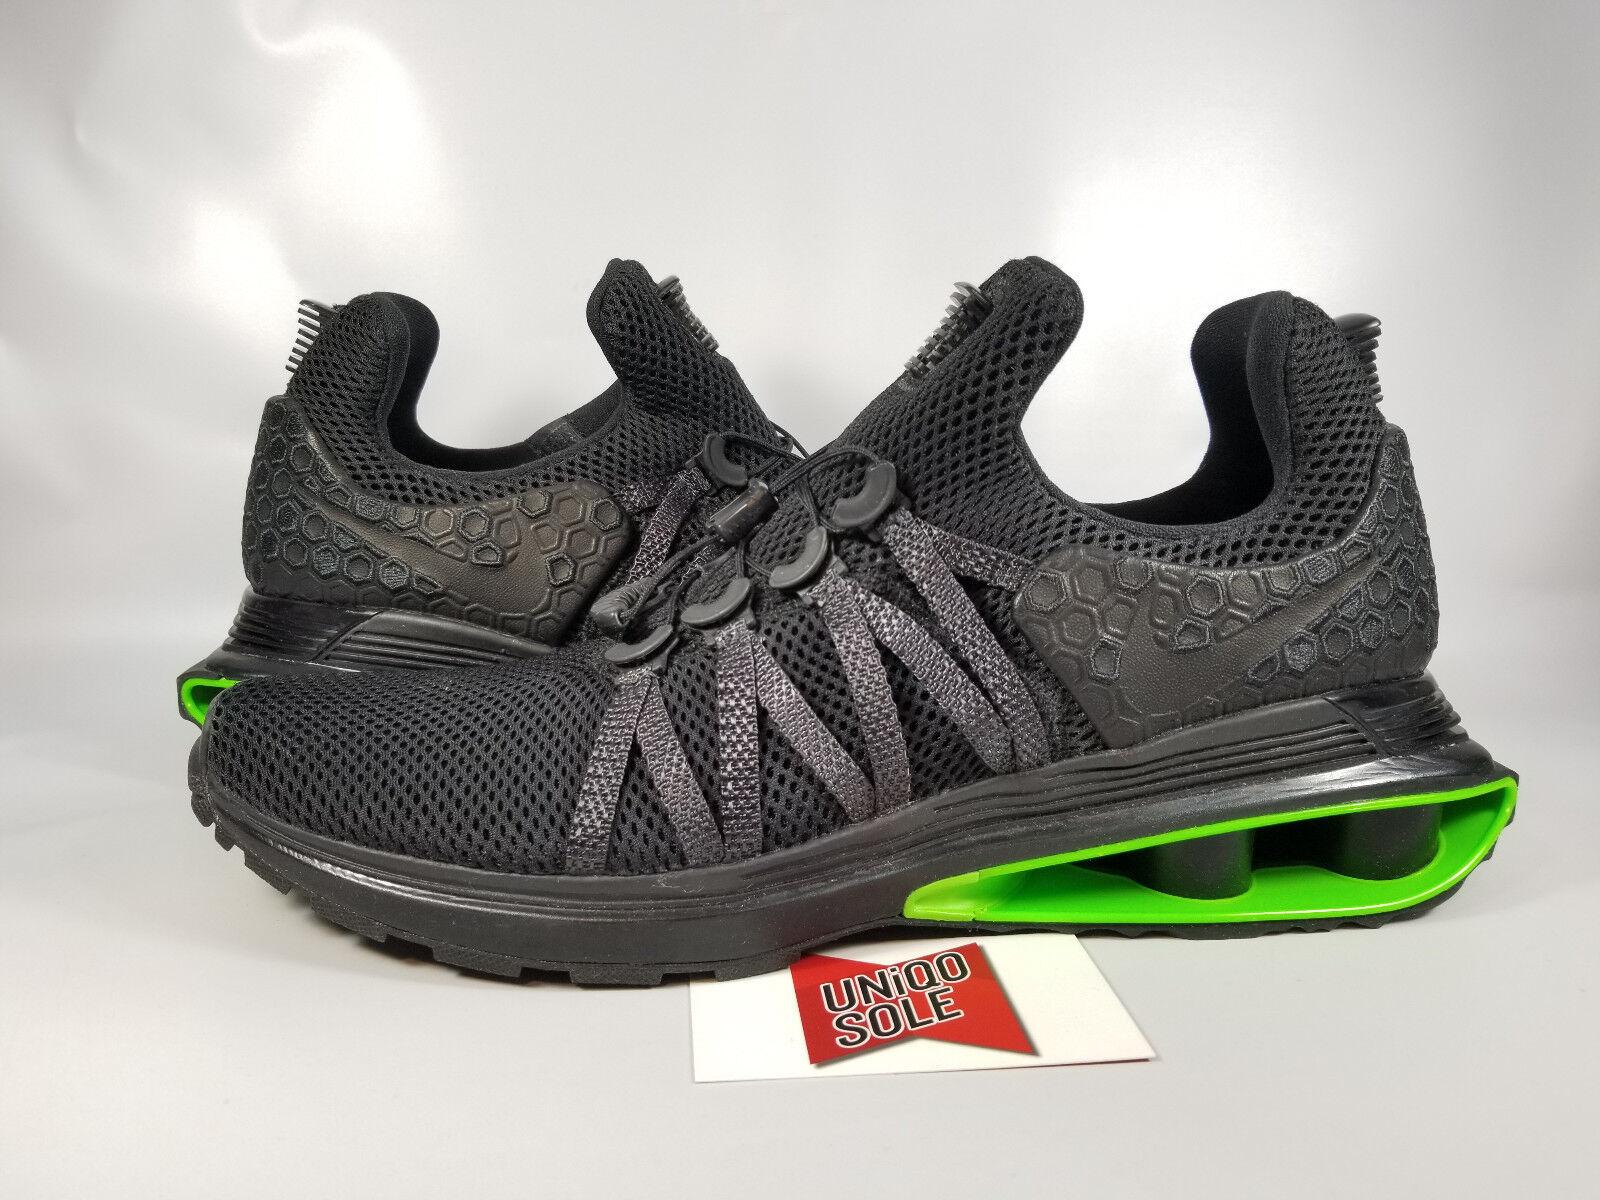 Nike Shox STRIKE Gravity Luxe BLACK GREEN STRIKE Shox VOLT AR1470-003 sz 11 TURBO NZ CHROME 49b0a9